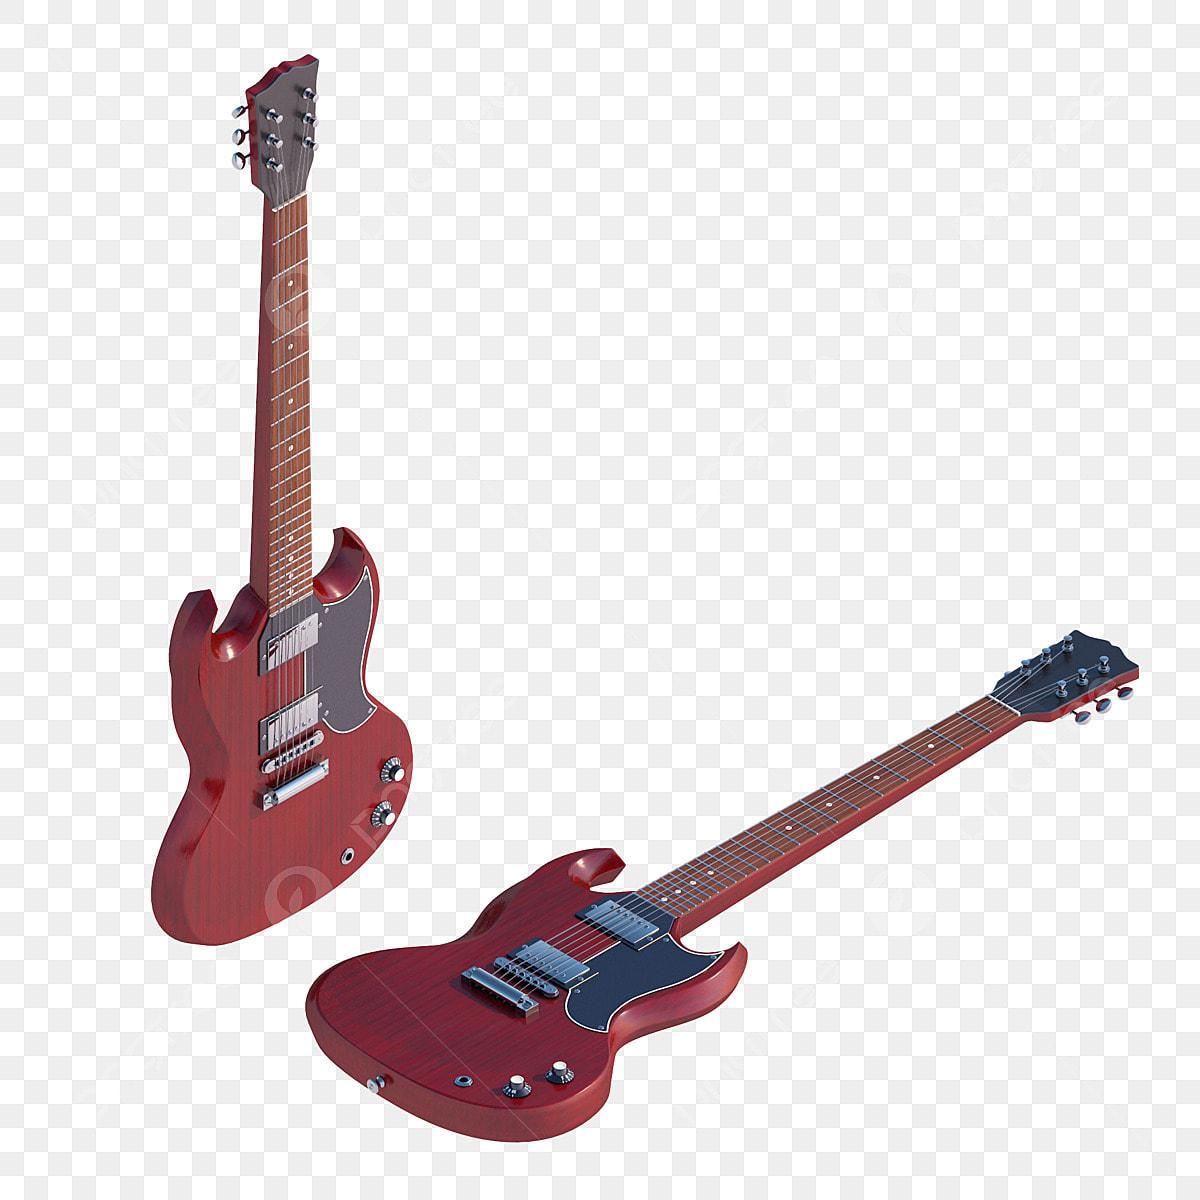 E-Gitarren-Vektor-Illustration - Download Kostenlos Vector, Clipart  Graphics, Vektorgrafiken und Design Vorlagen